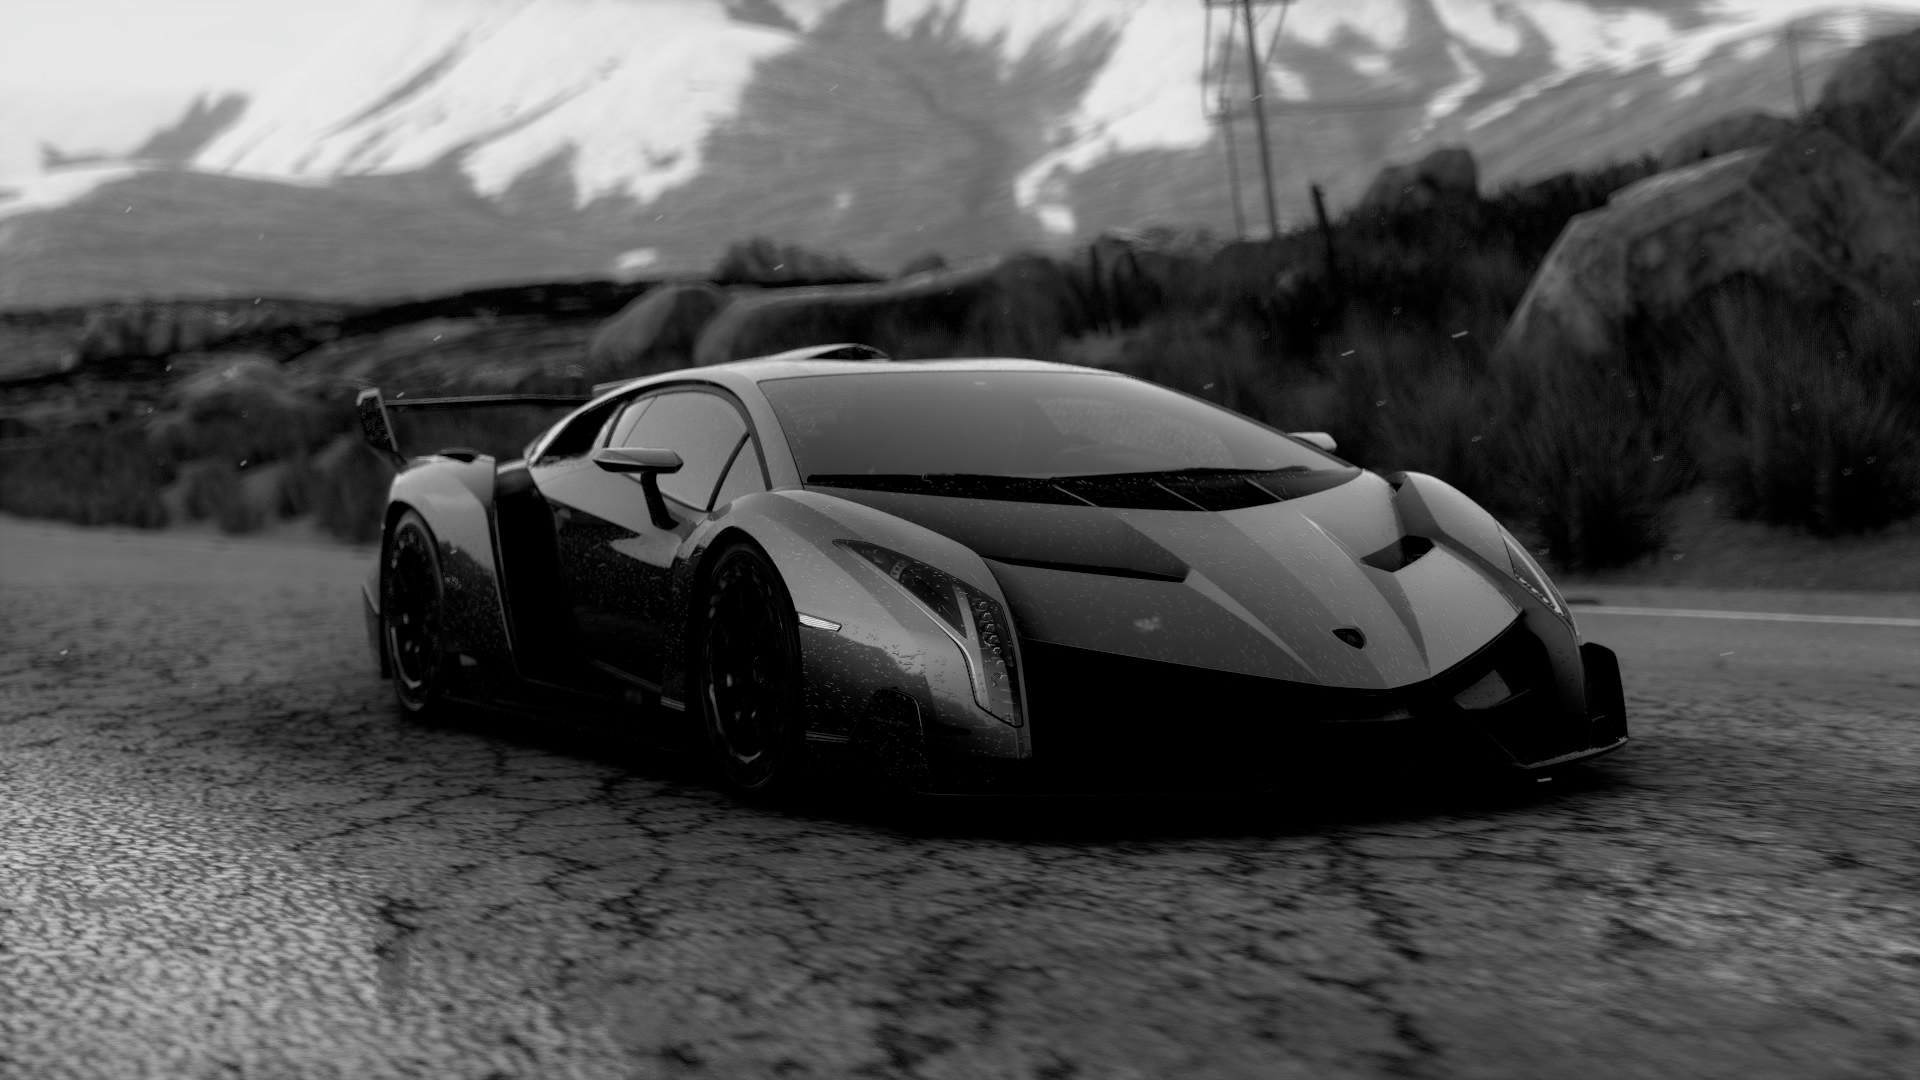 General 1920x1080 car Driveclub Driveclub racing racing Lamborghini Veneno render